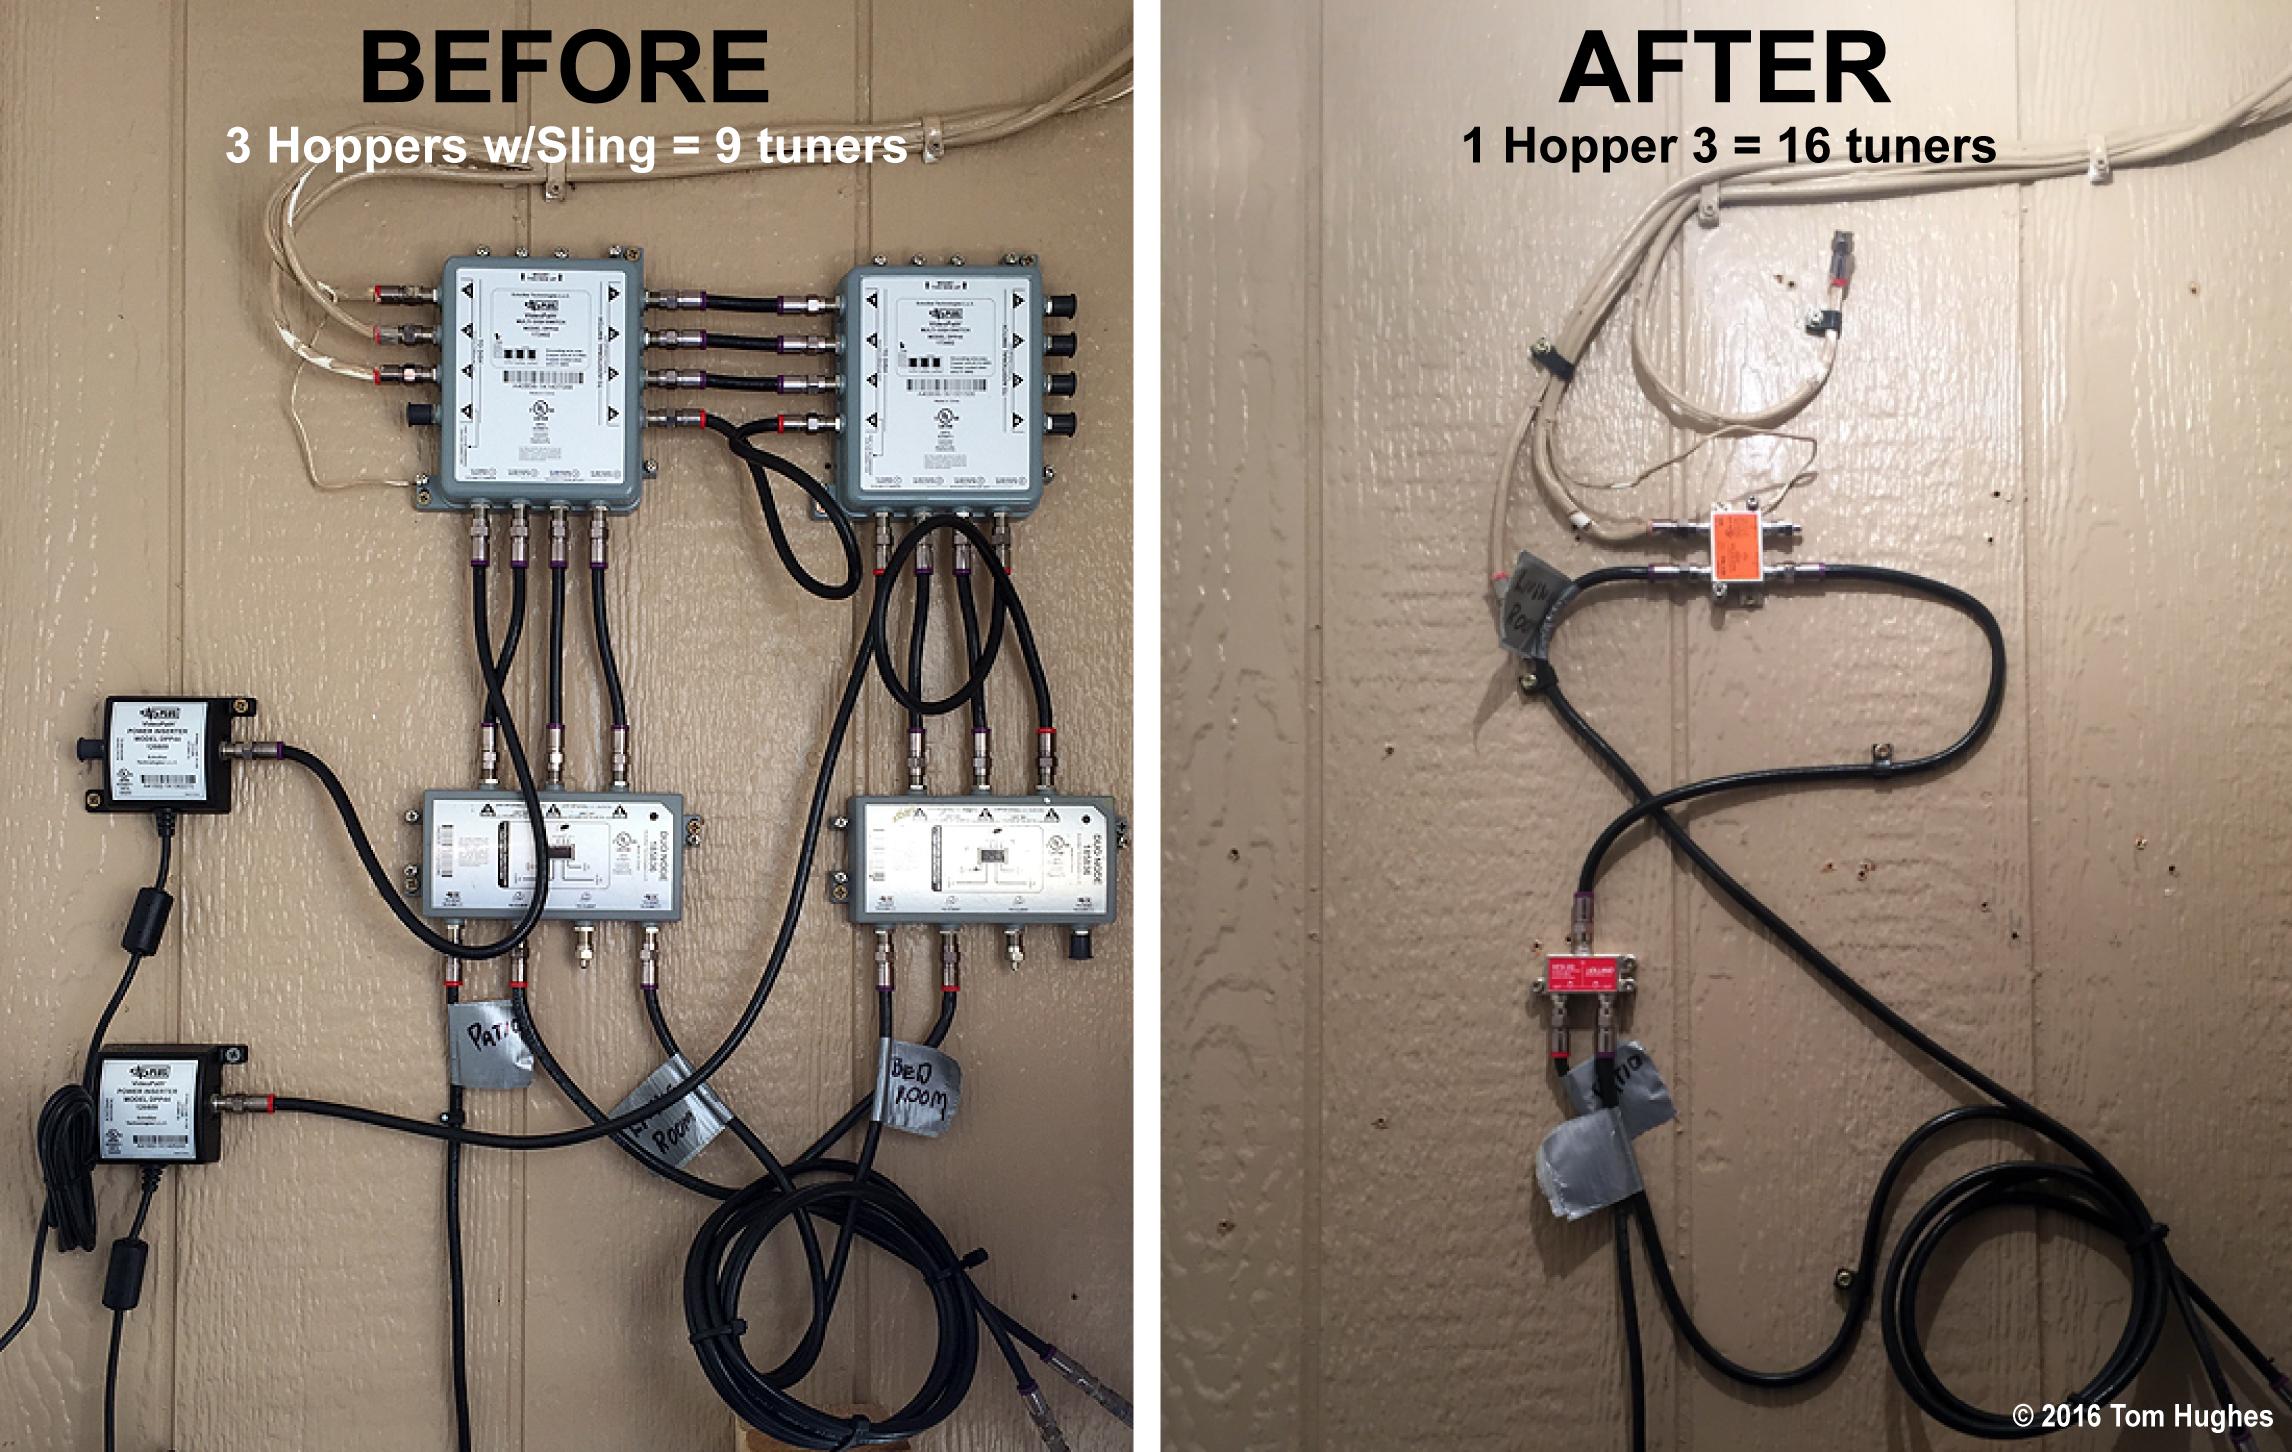 hopper3_install03_before after wiring?resize=665%2C421 dish tv hopper wiring diagram the best wiring diagram 2017 dish tv wiring at honlapkeszites.co